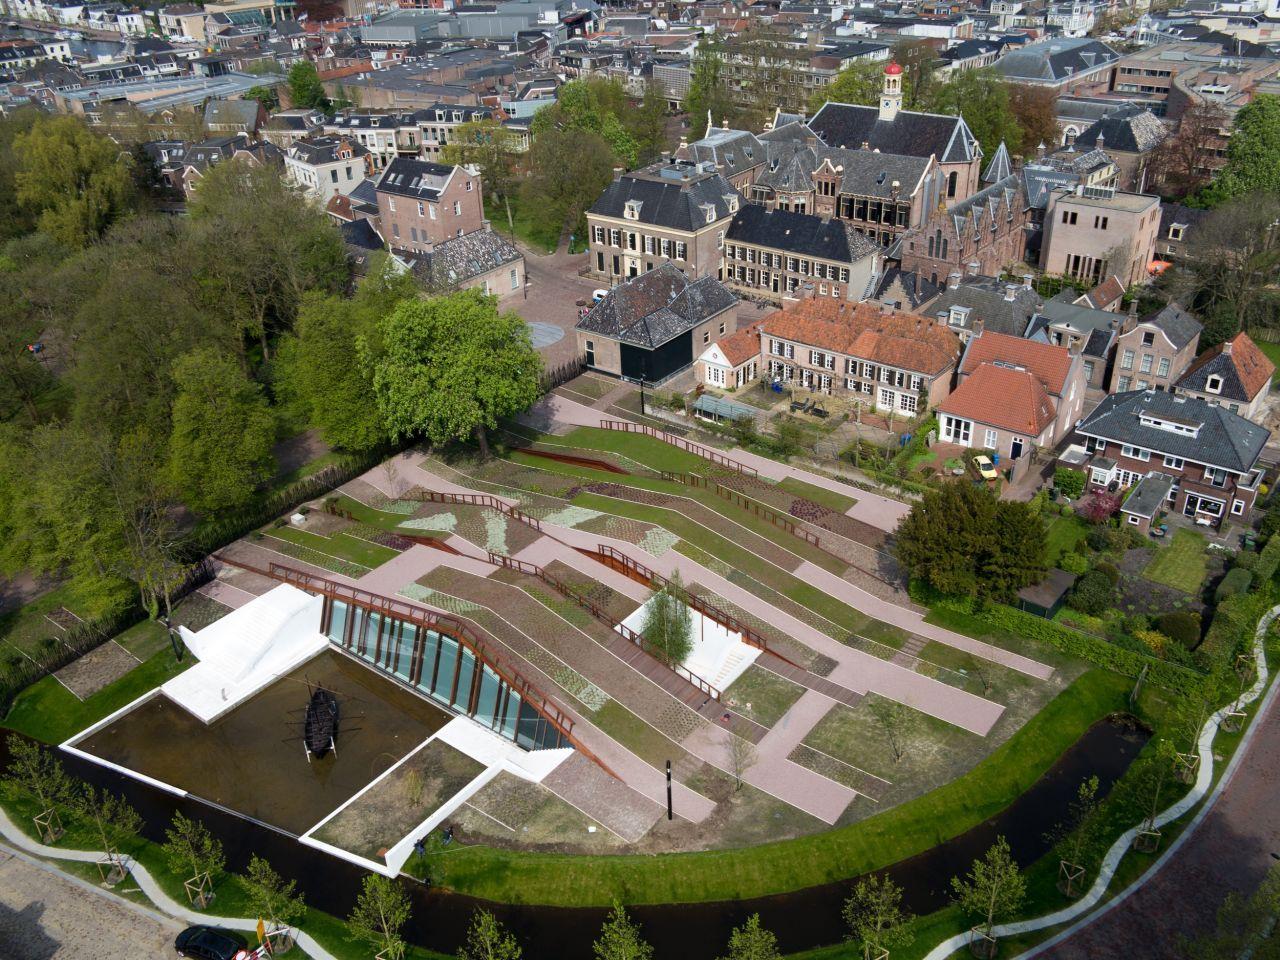 Museu Drents / Erick van Egeraat, © J Collingridge